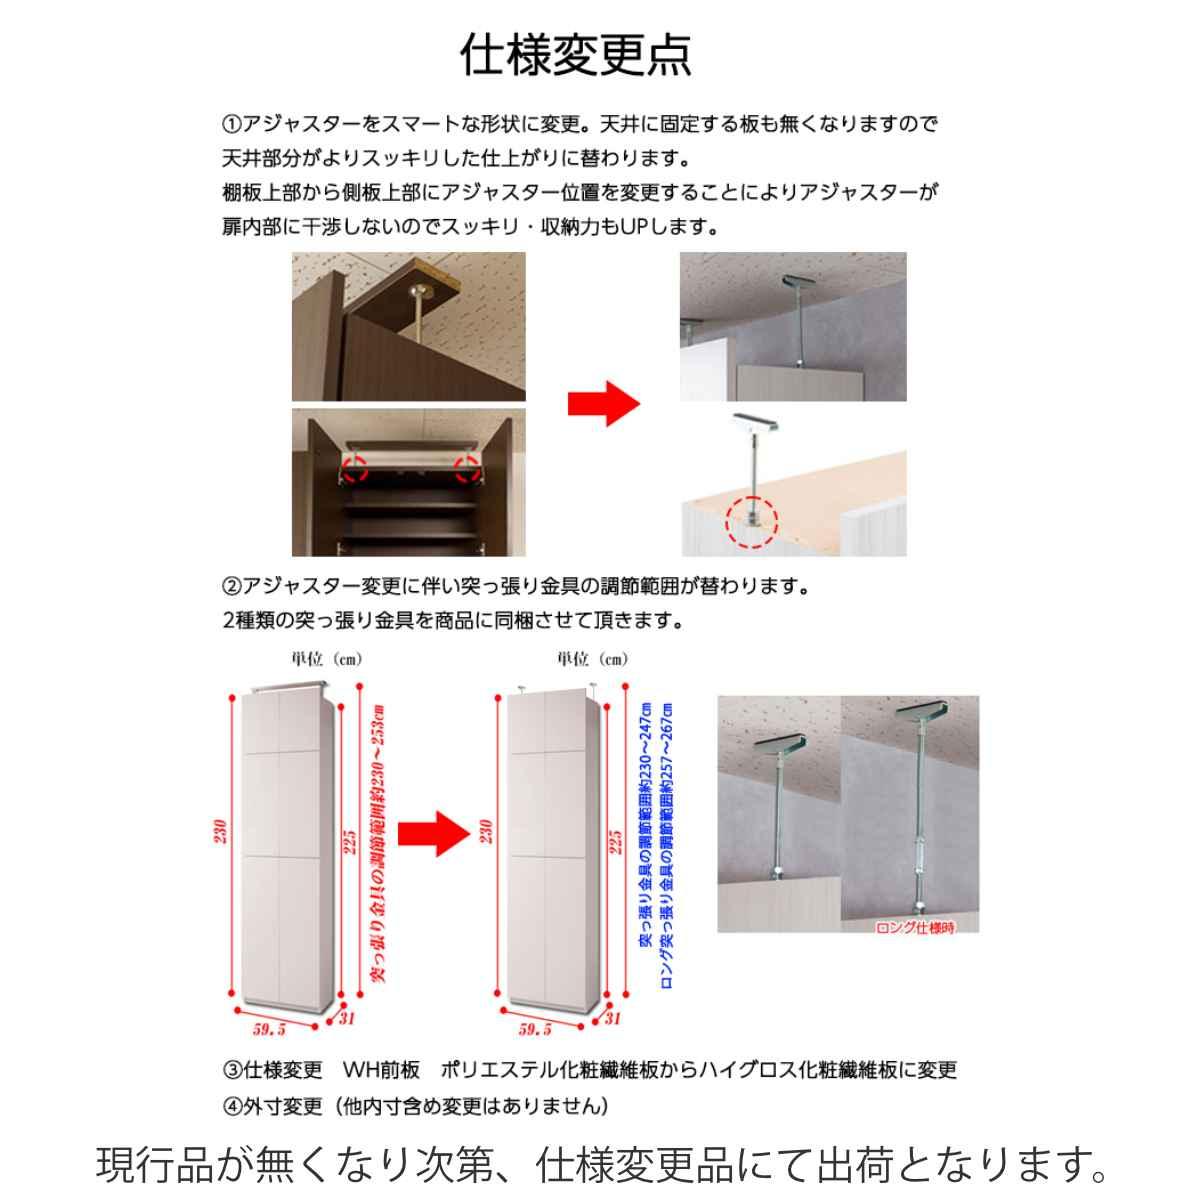 ... Wall storage cabinet width 60 cm door type ? seismic prop storage dry storage Bookcase with ...  sc 1 st  Rakuten & livingut   Rakuten Global Market: Wall storage cabinet width 60 cm ...